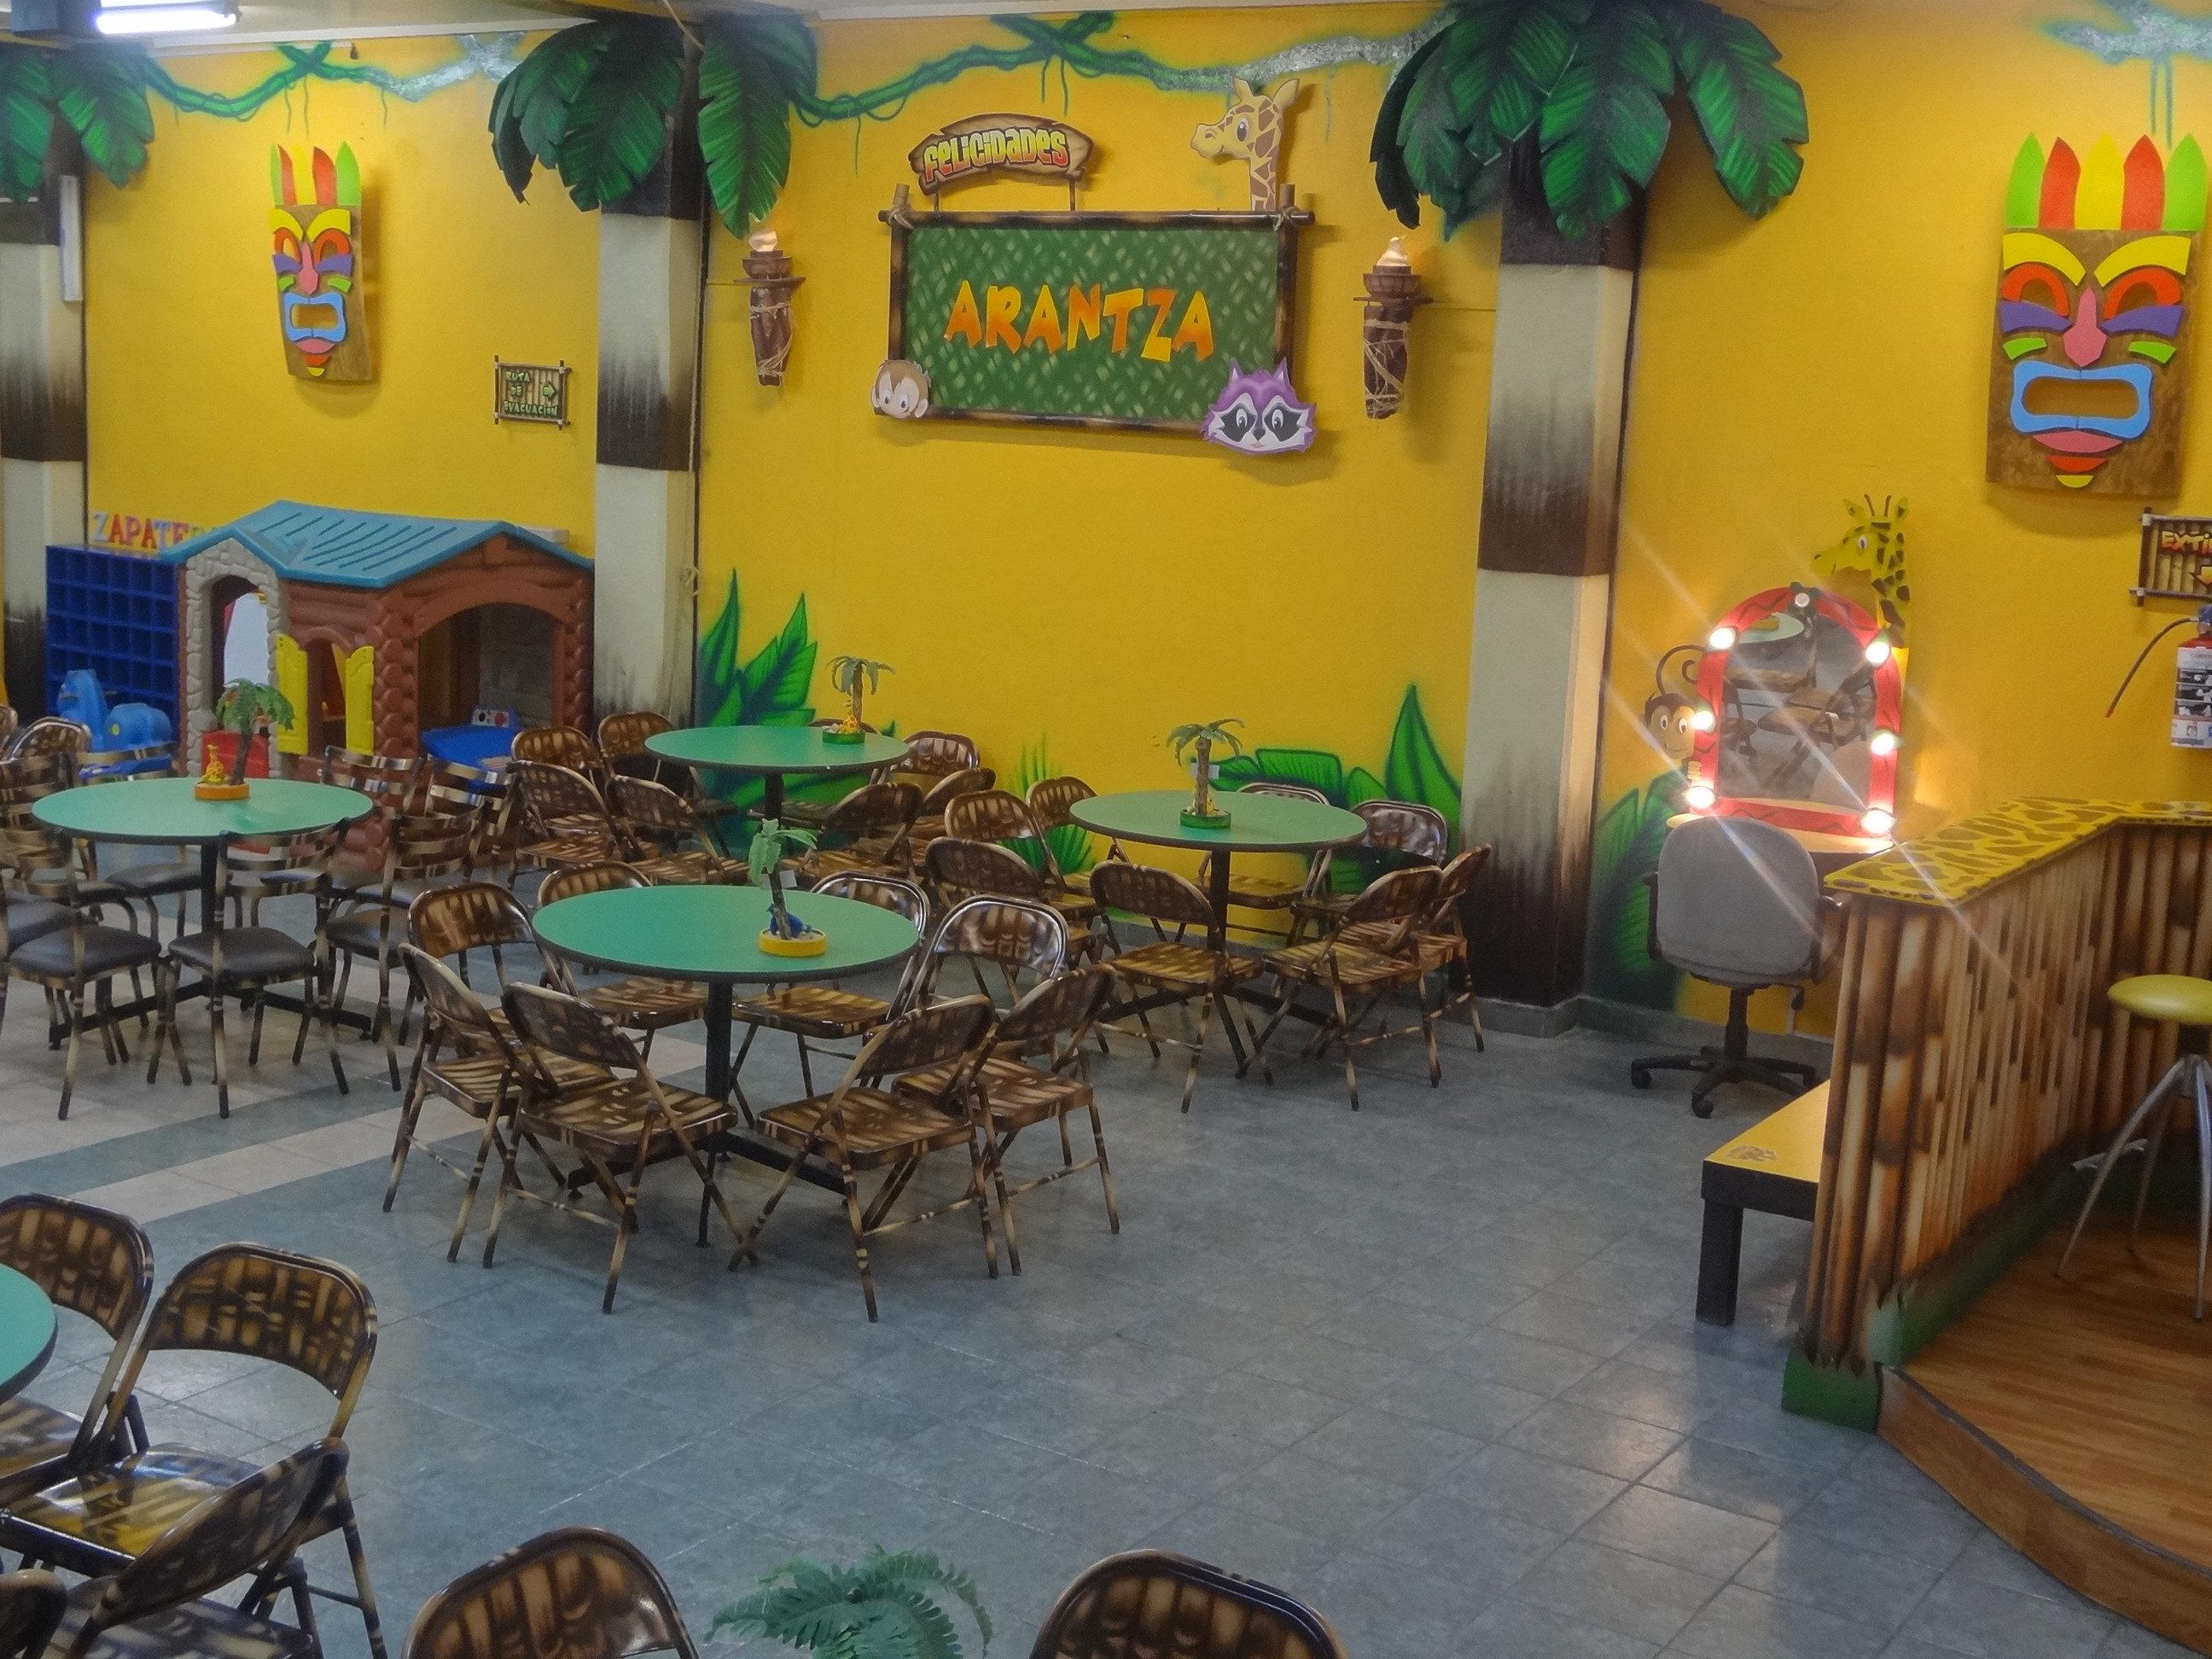 Salon de fiestas infantiles chikukis salones para fiestas for Acropolis salon de fiestas